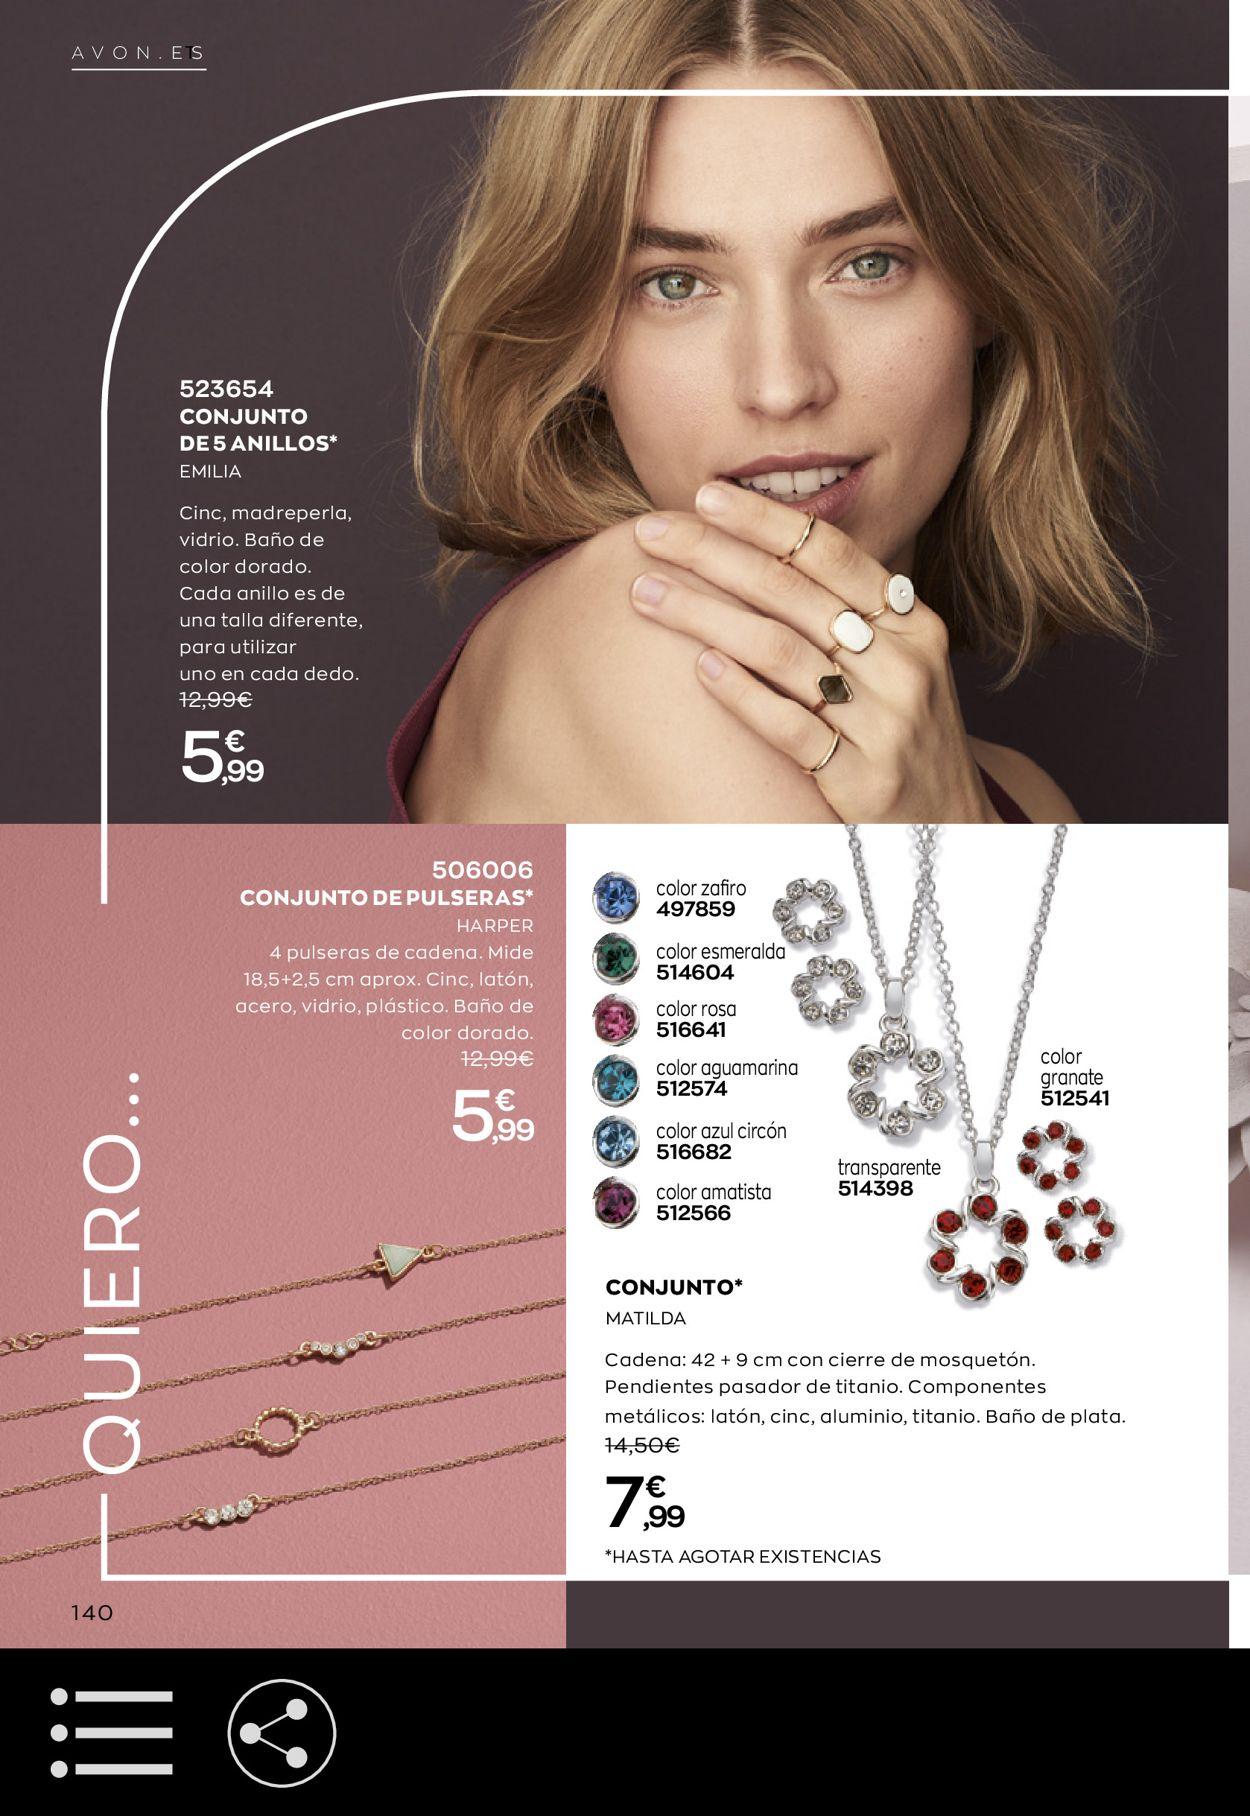 Avon Folleto - 12.09-01.10.2020 (Página 140)